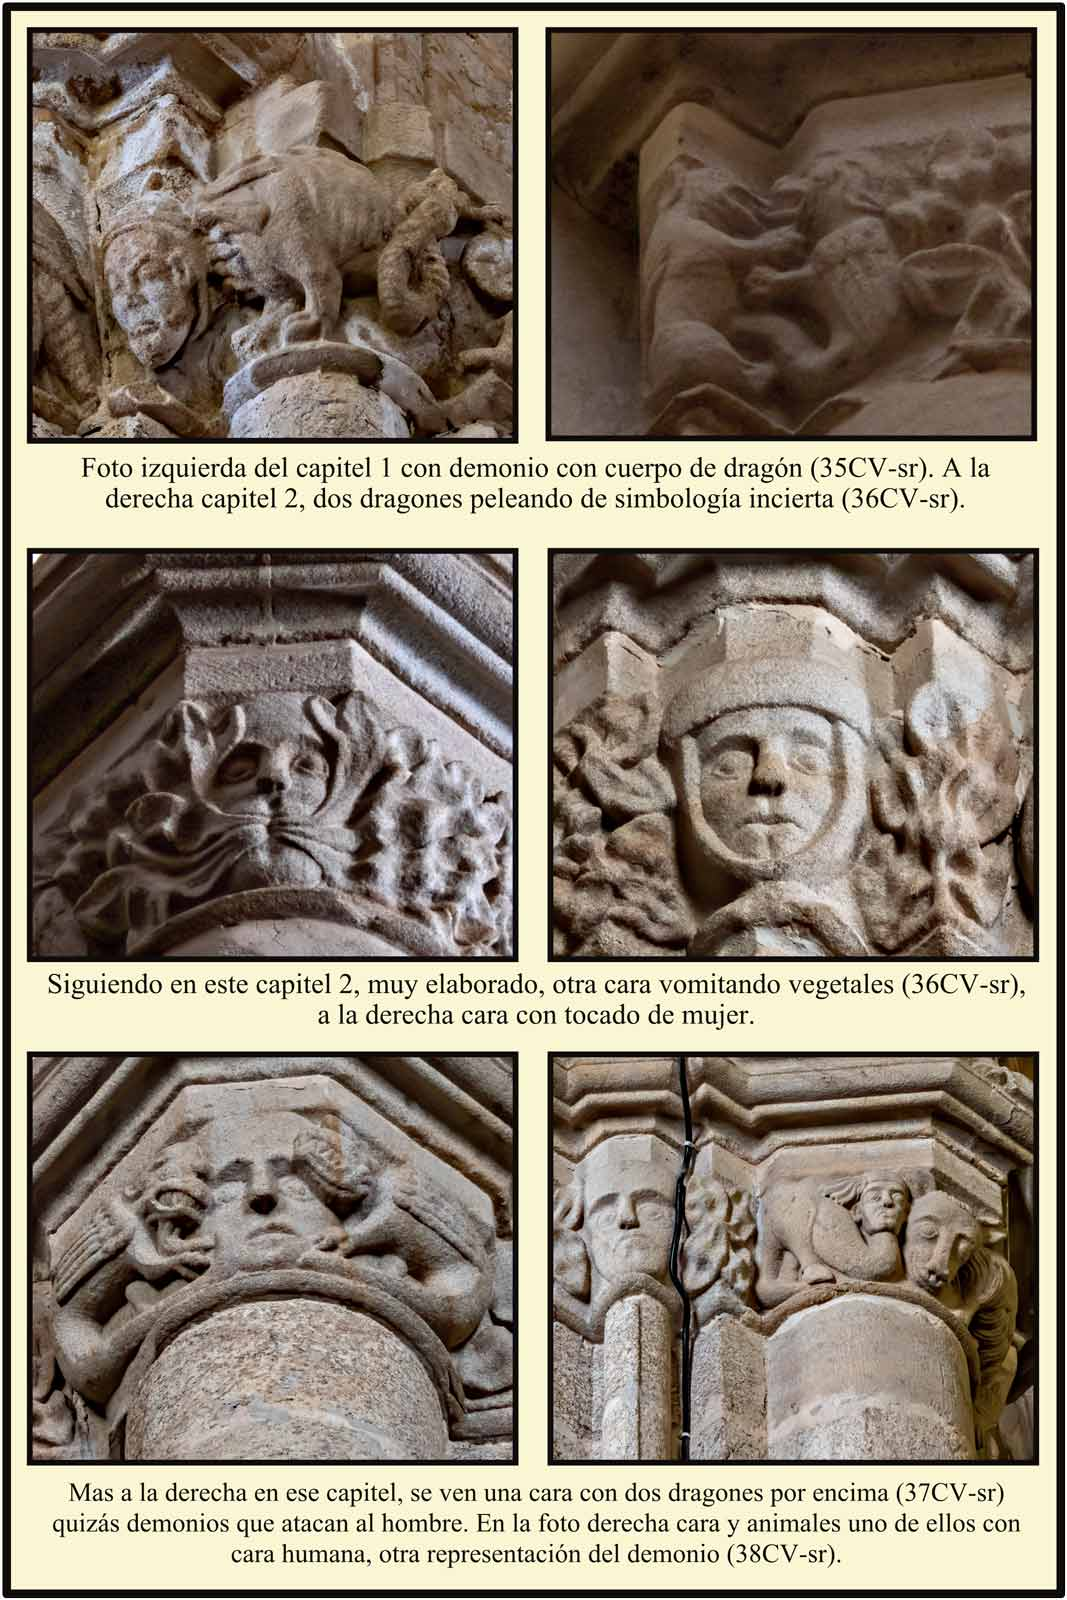 Capiteles romanicos Catedral Vieja Plasencia demonio hombre vegetal